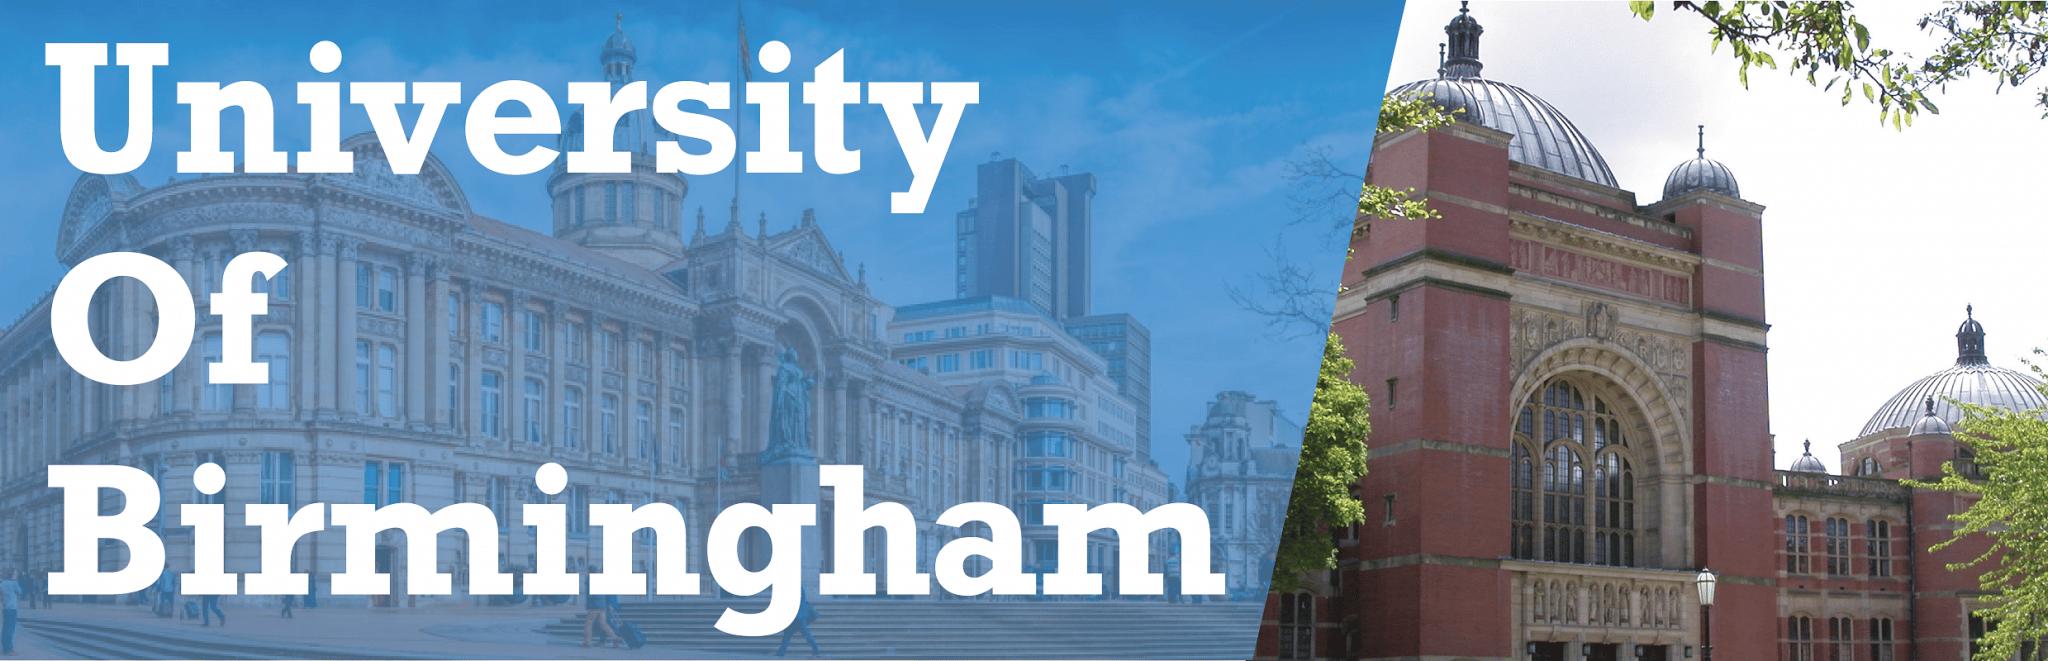 University of Birmingham - Banner